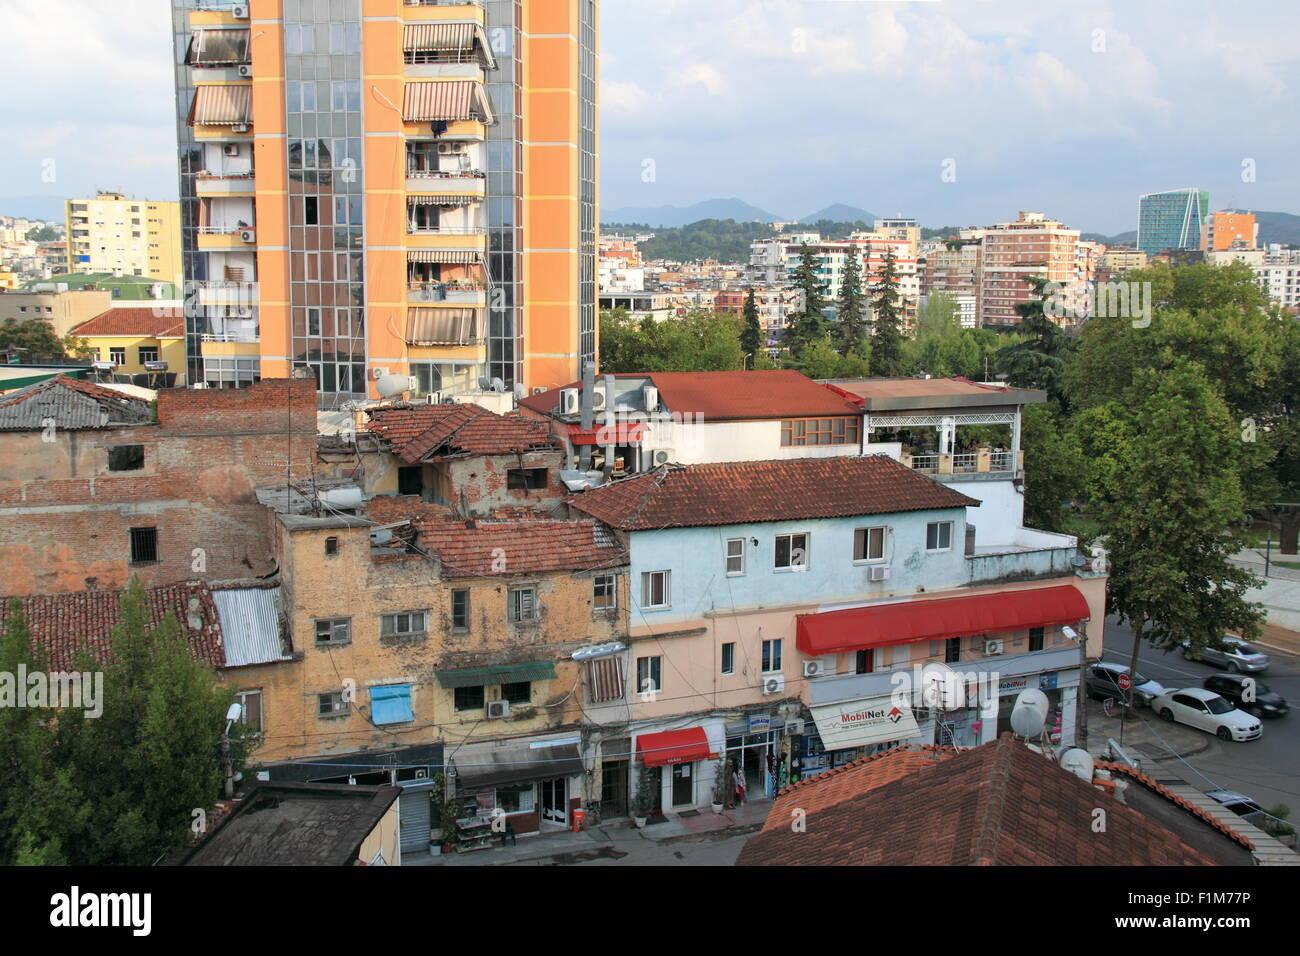 View of rooftops of Rruga Myrtëzim Kelliçi from Hotel Vila Alba, Tirana, Albania, Balkans, Europe - Stock Image